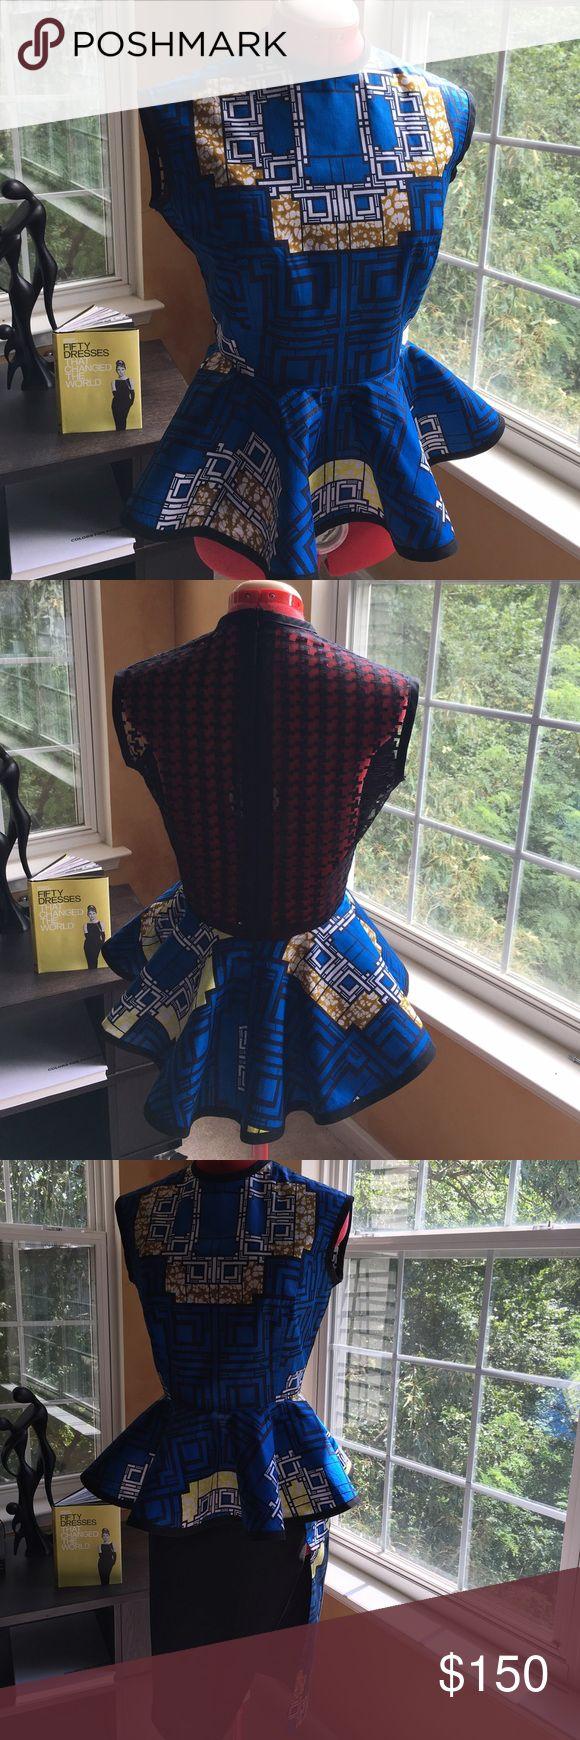 Ankara Two Piece Suit Ankara Cotton Peplum Top With Lace